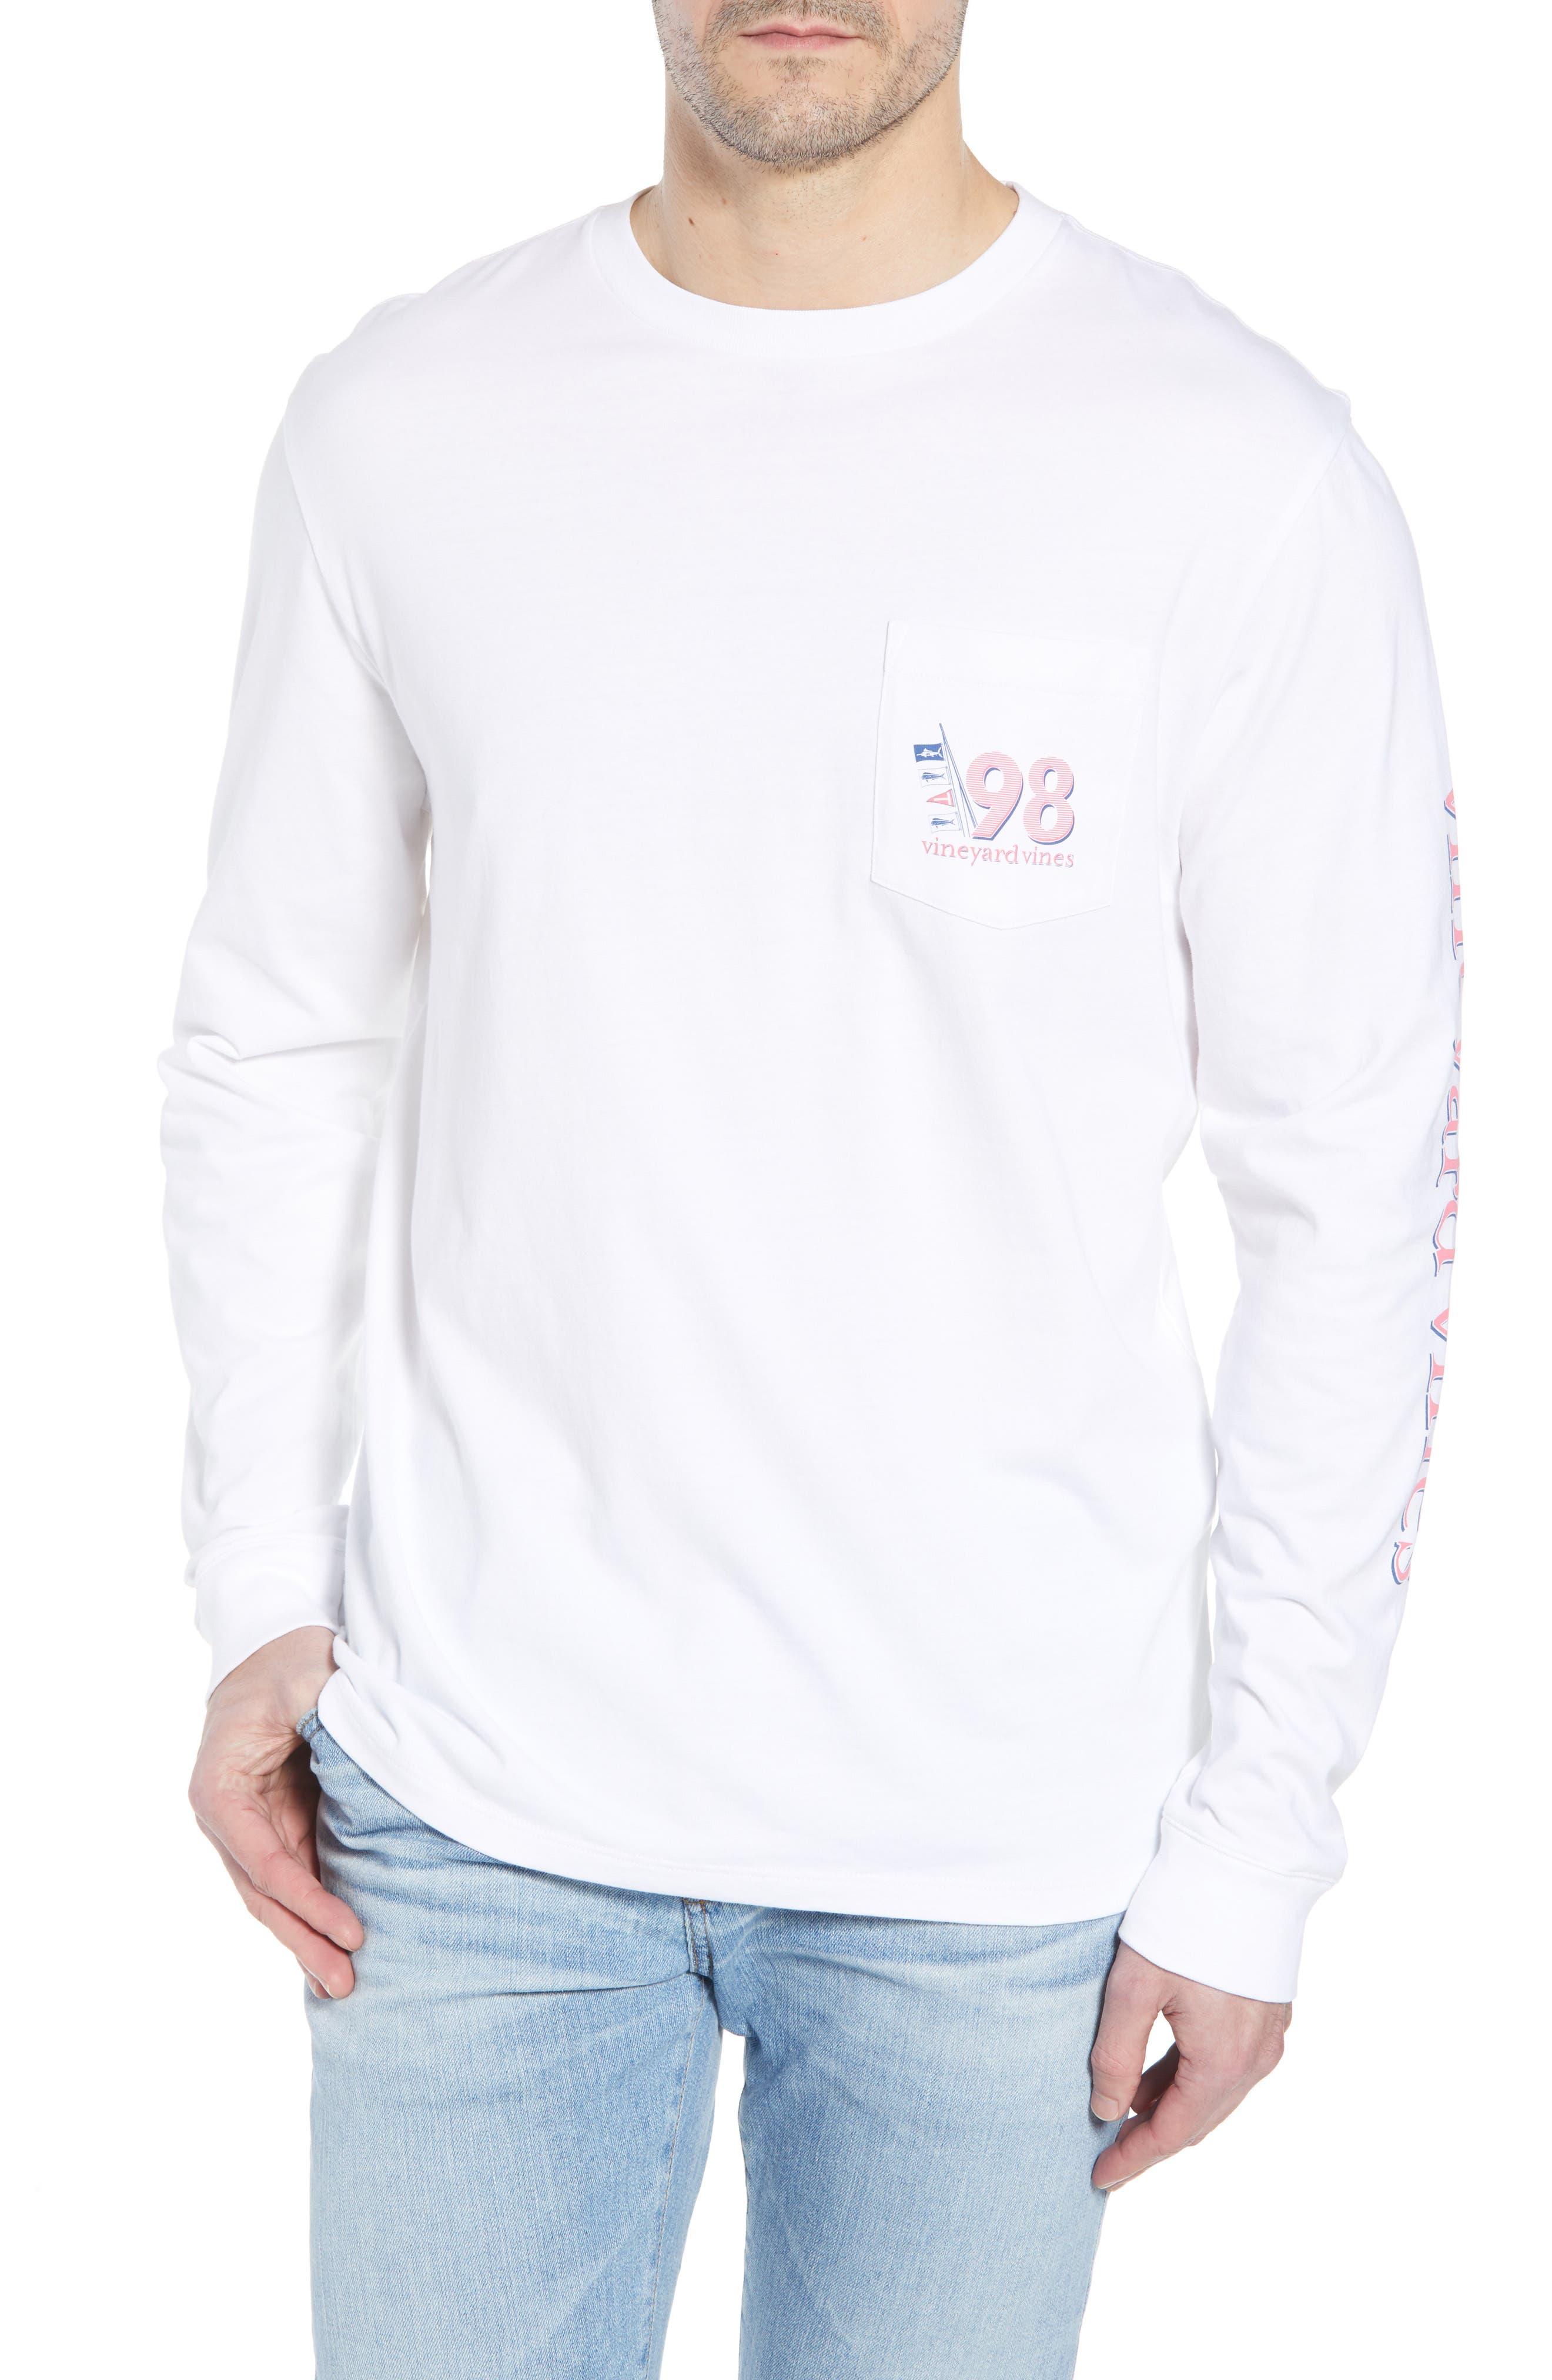 Sportfisher Regular Fit Crewneck T-Shirt,                             Main thumbnail 1, color,                             100